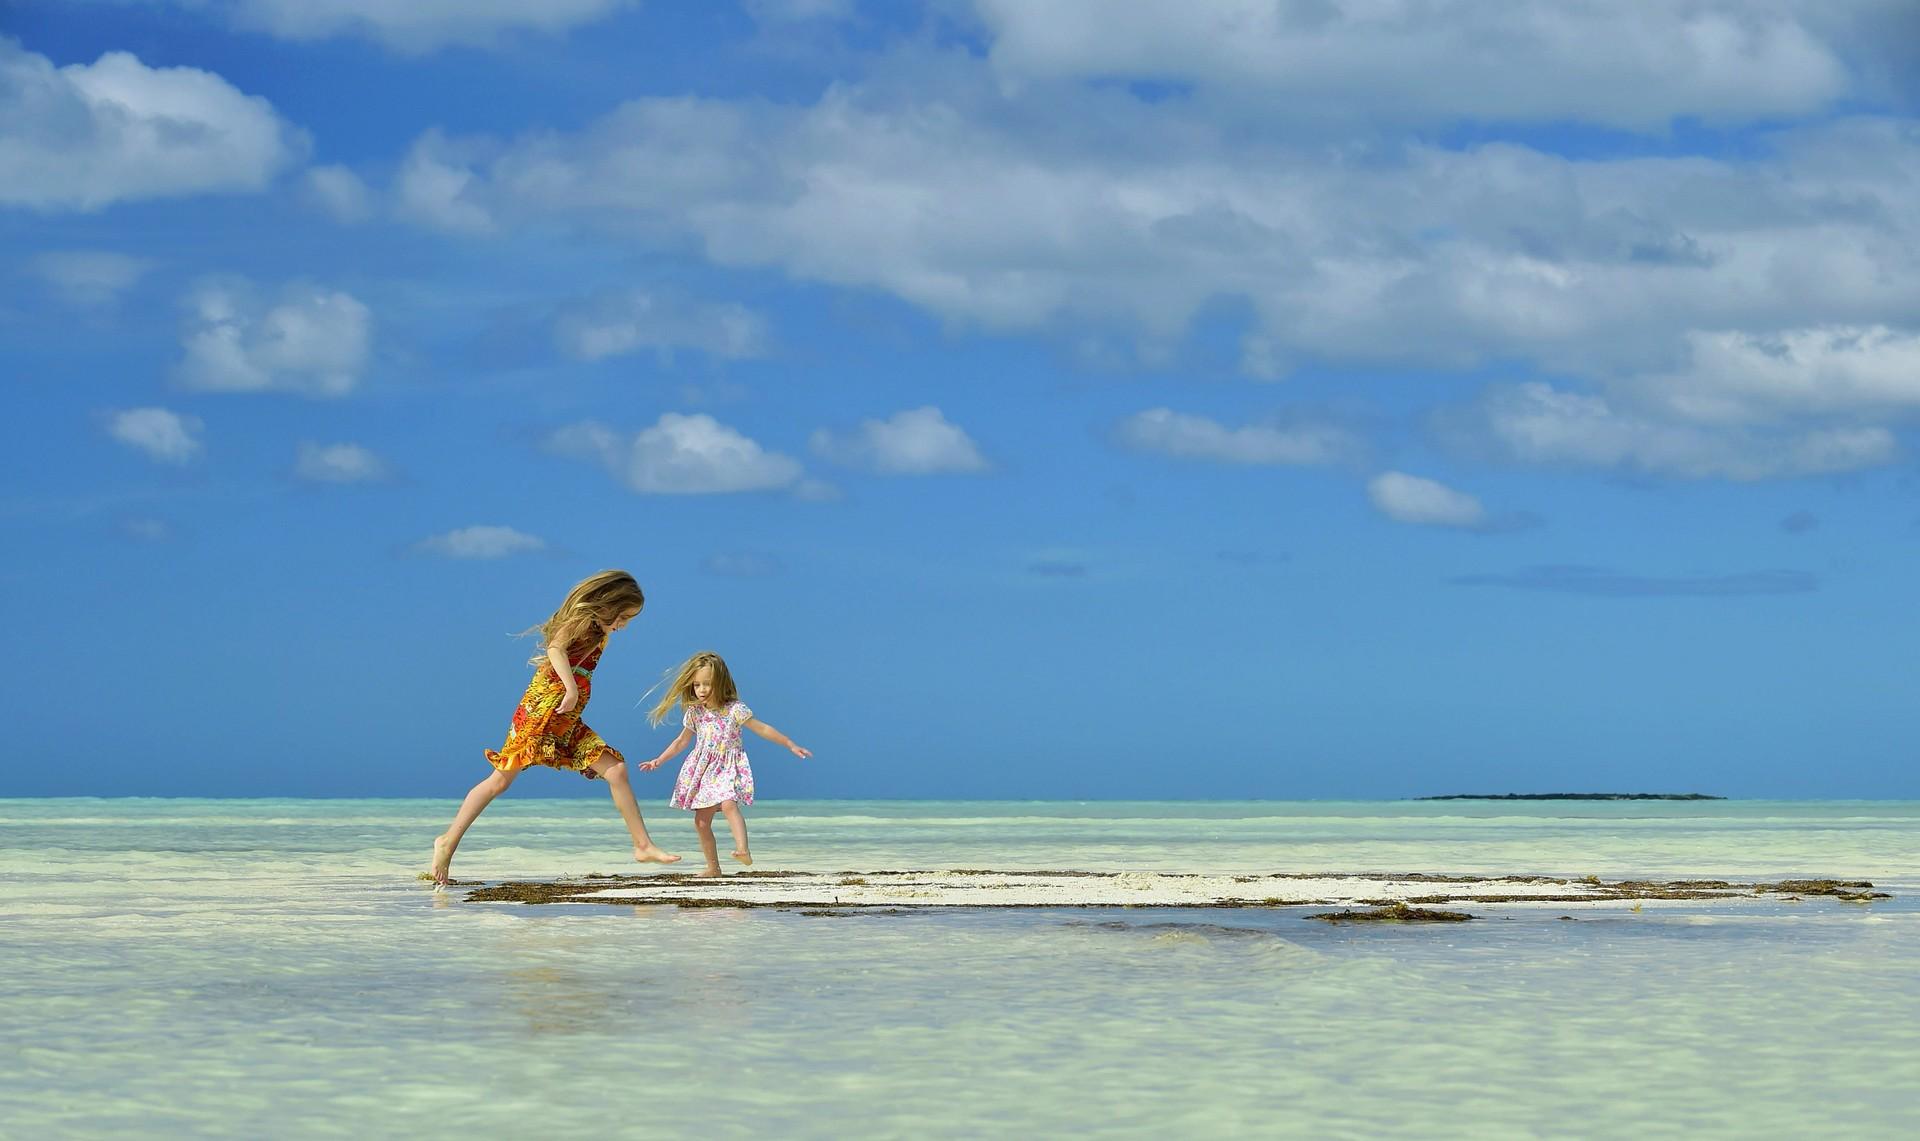 Two girls play on a sandbank in Caya Coco in Cuba